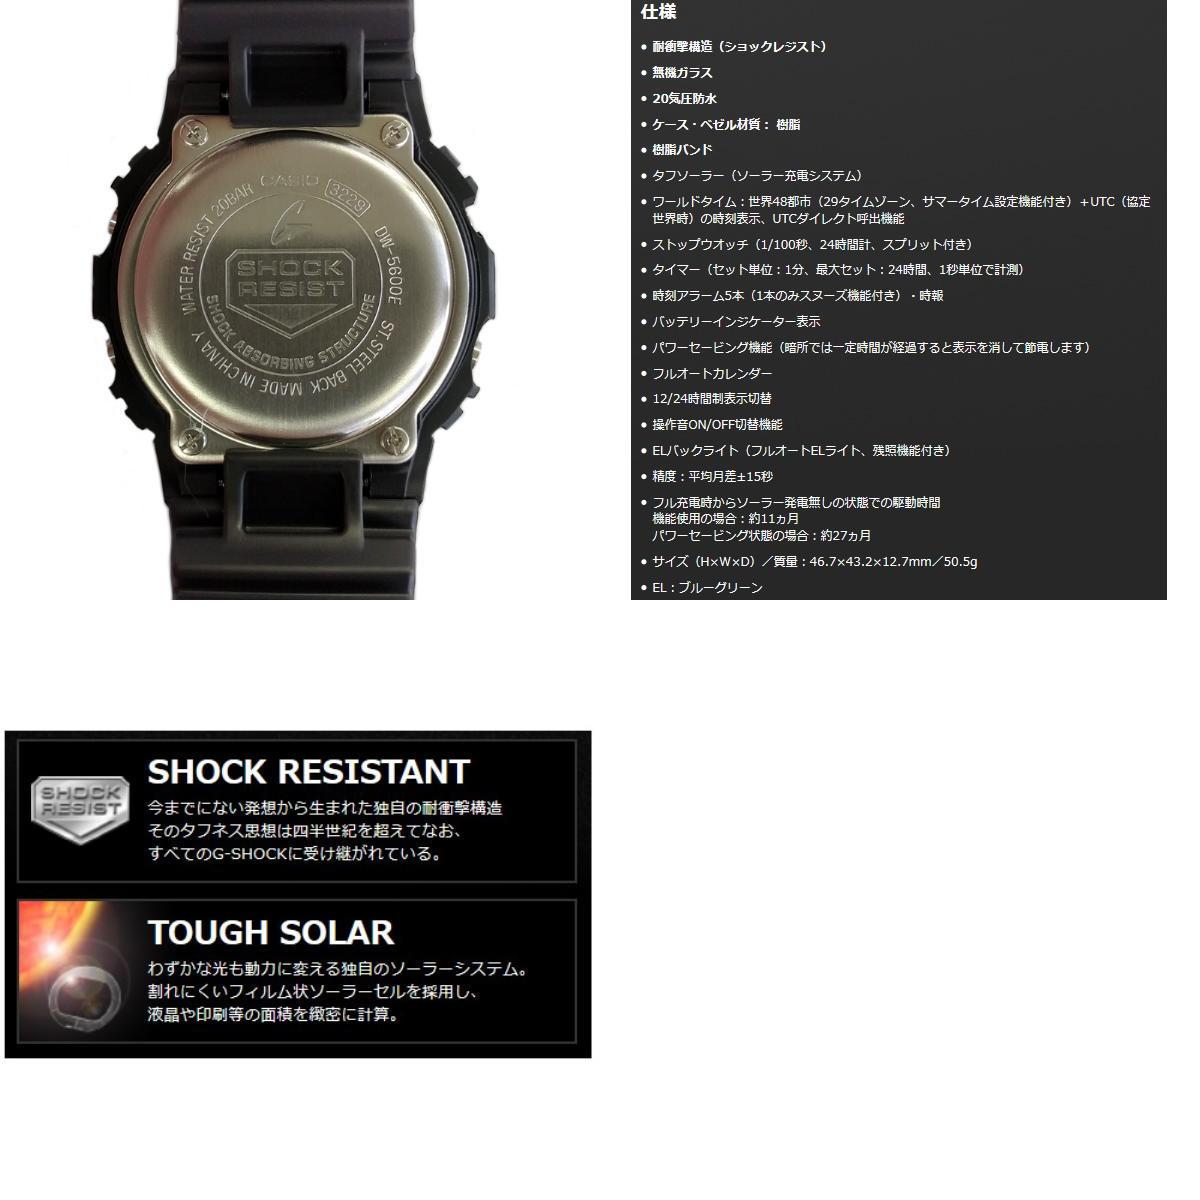 G-SHOCK(G打擊)G-5600E-1JF